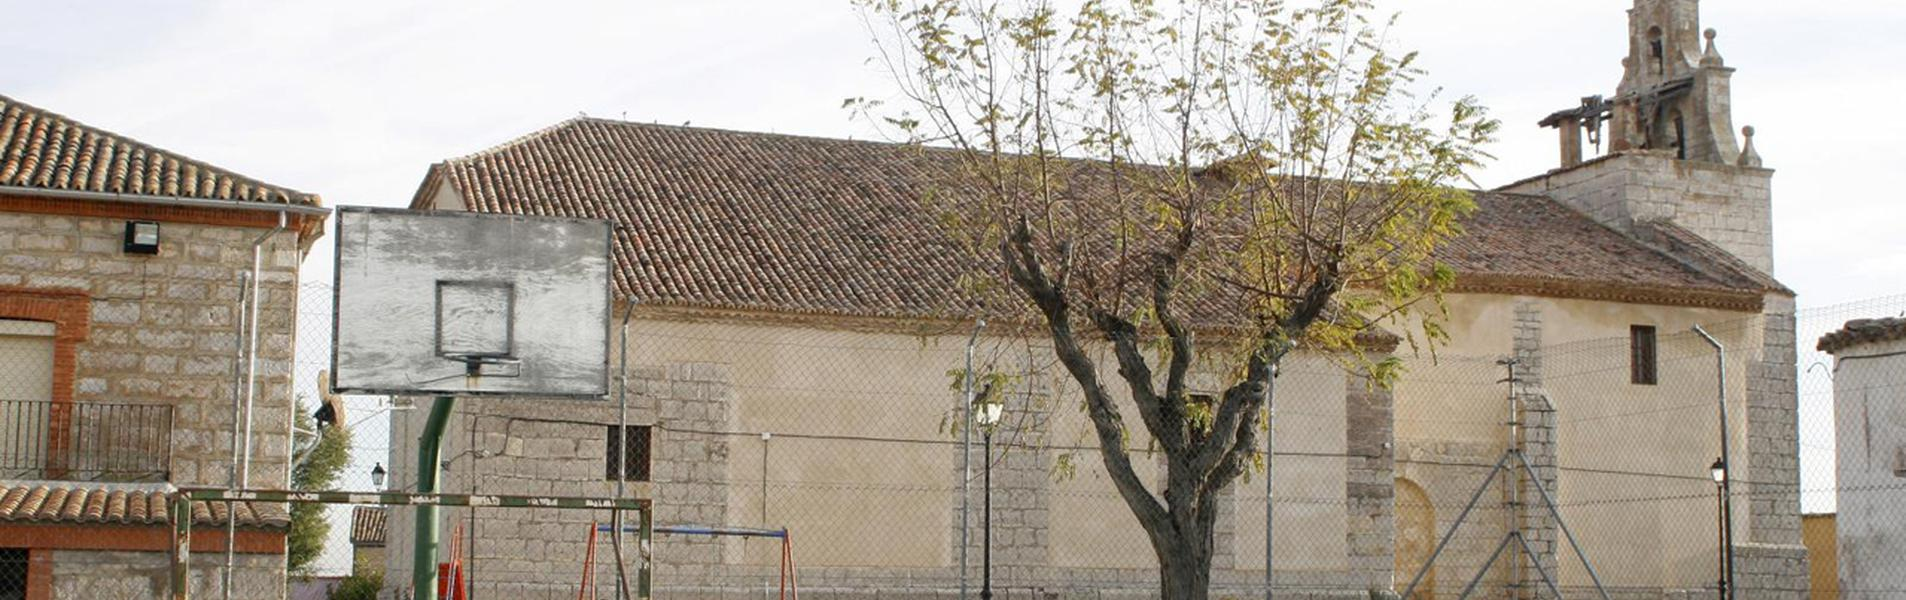 Pedrosa del Rey